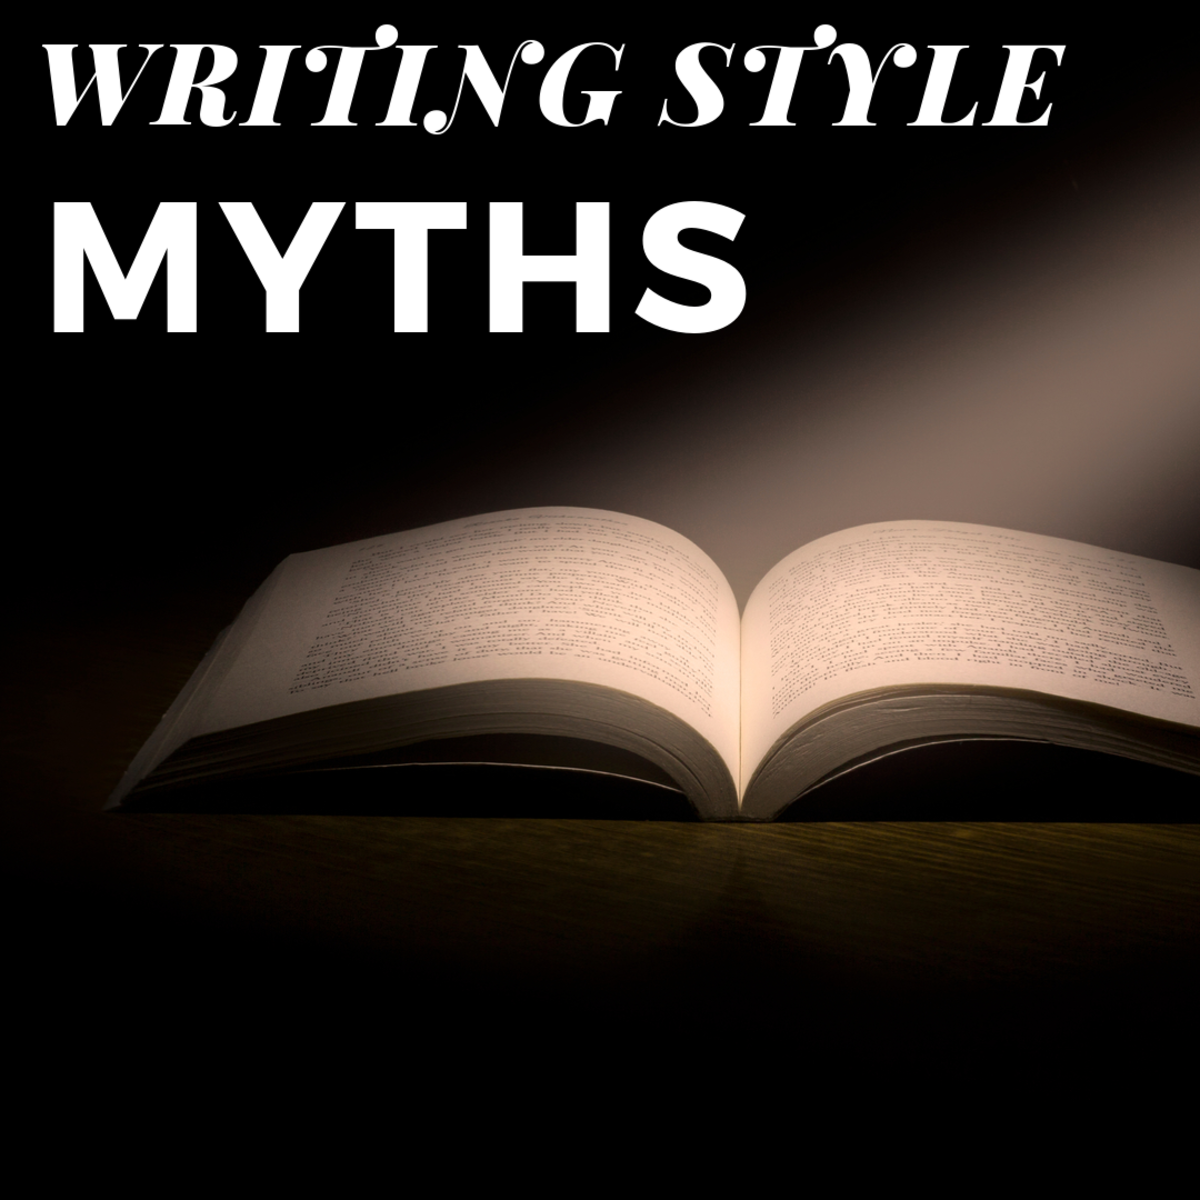 Writing Style Myths